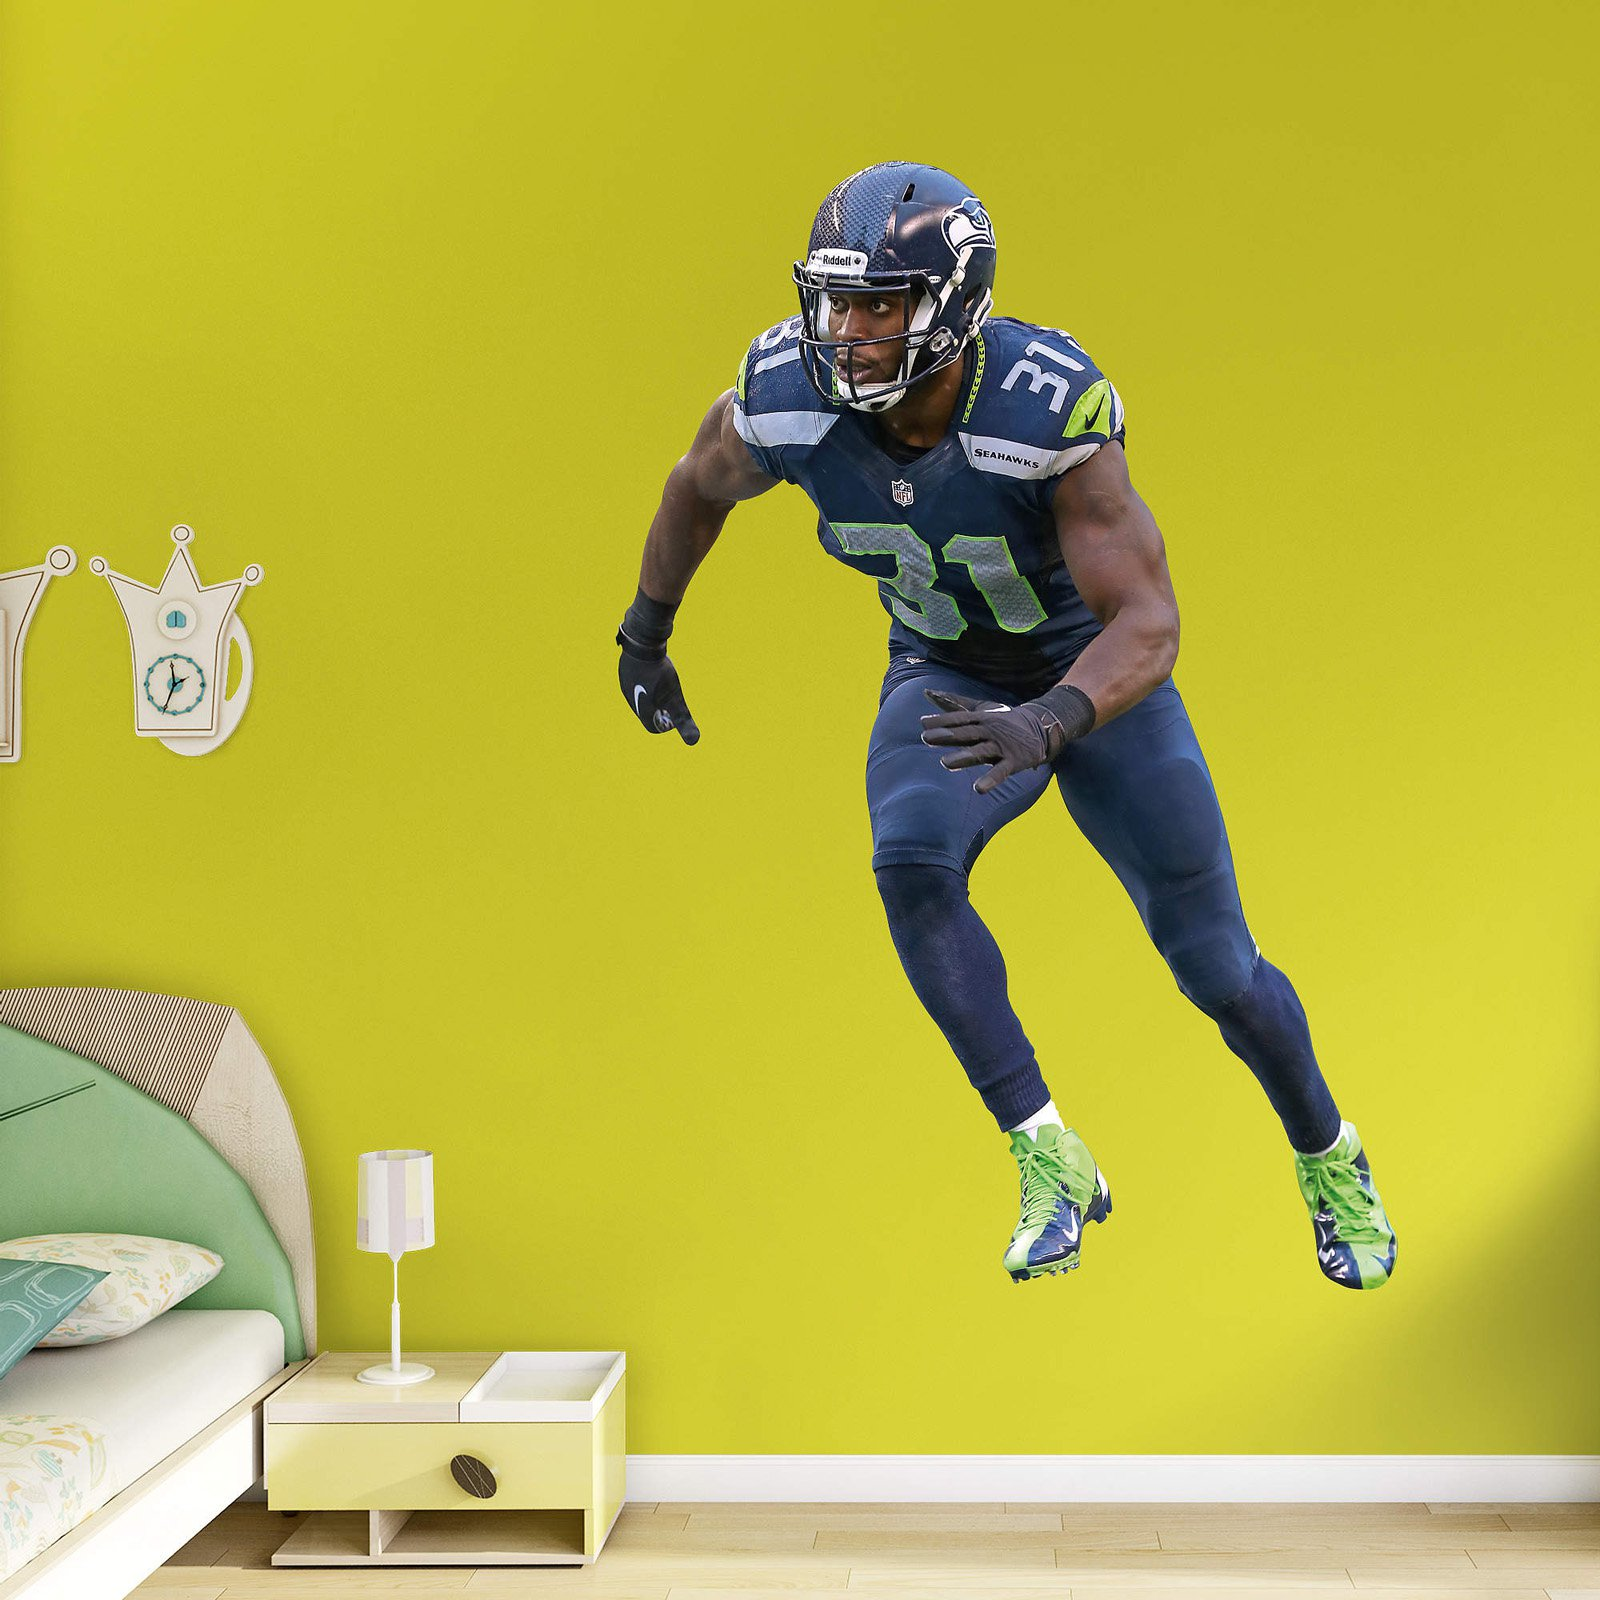 Fathead NFL Seattle Seahawks Kam Chancellor Wall Decal - Walmart.com